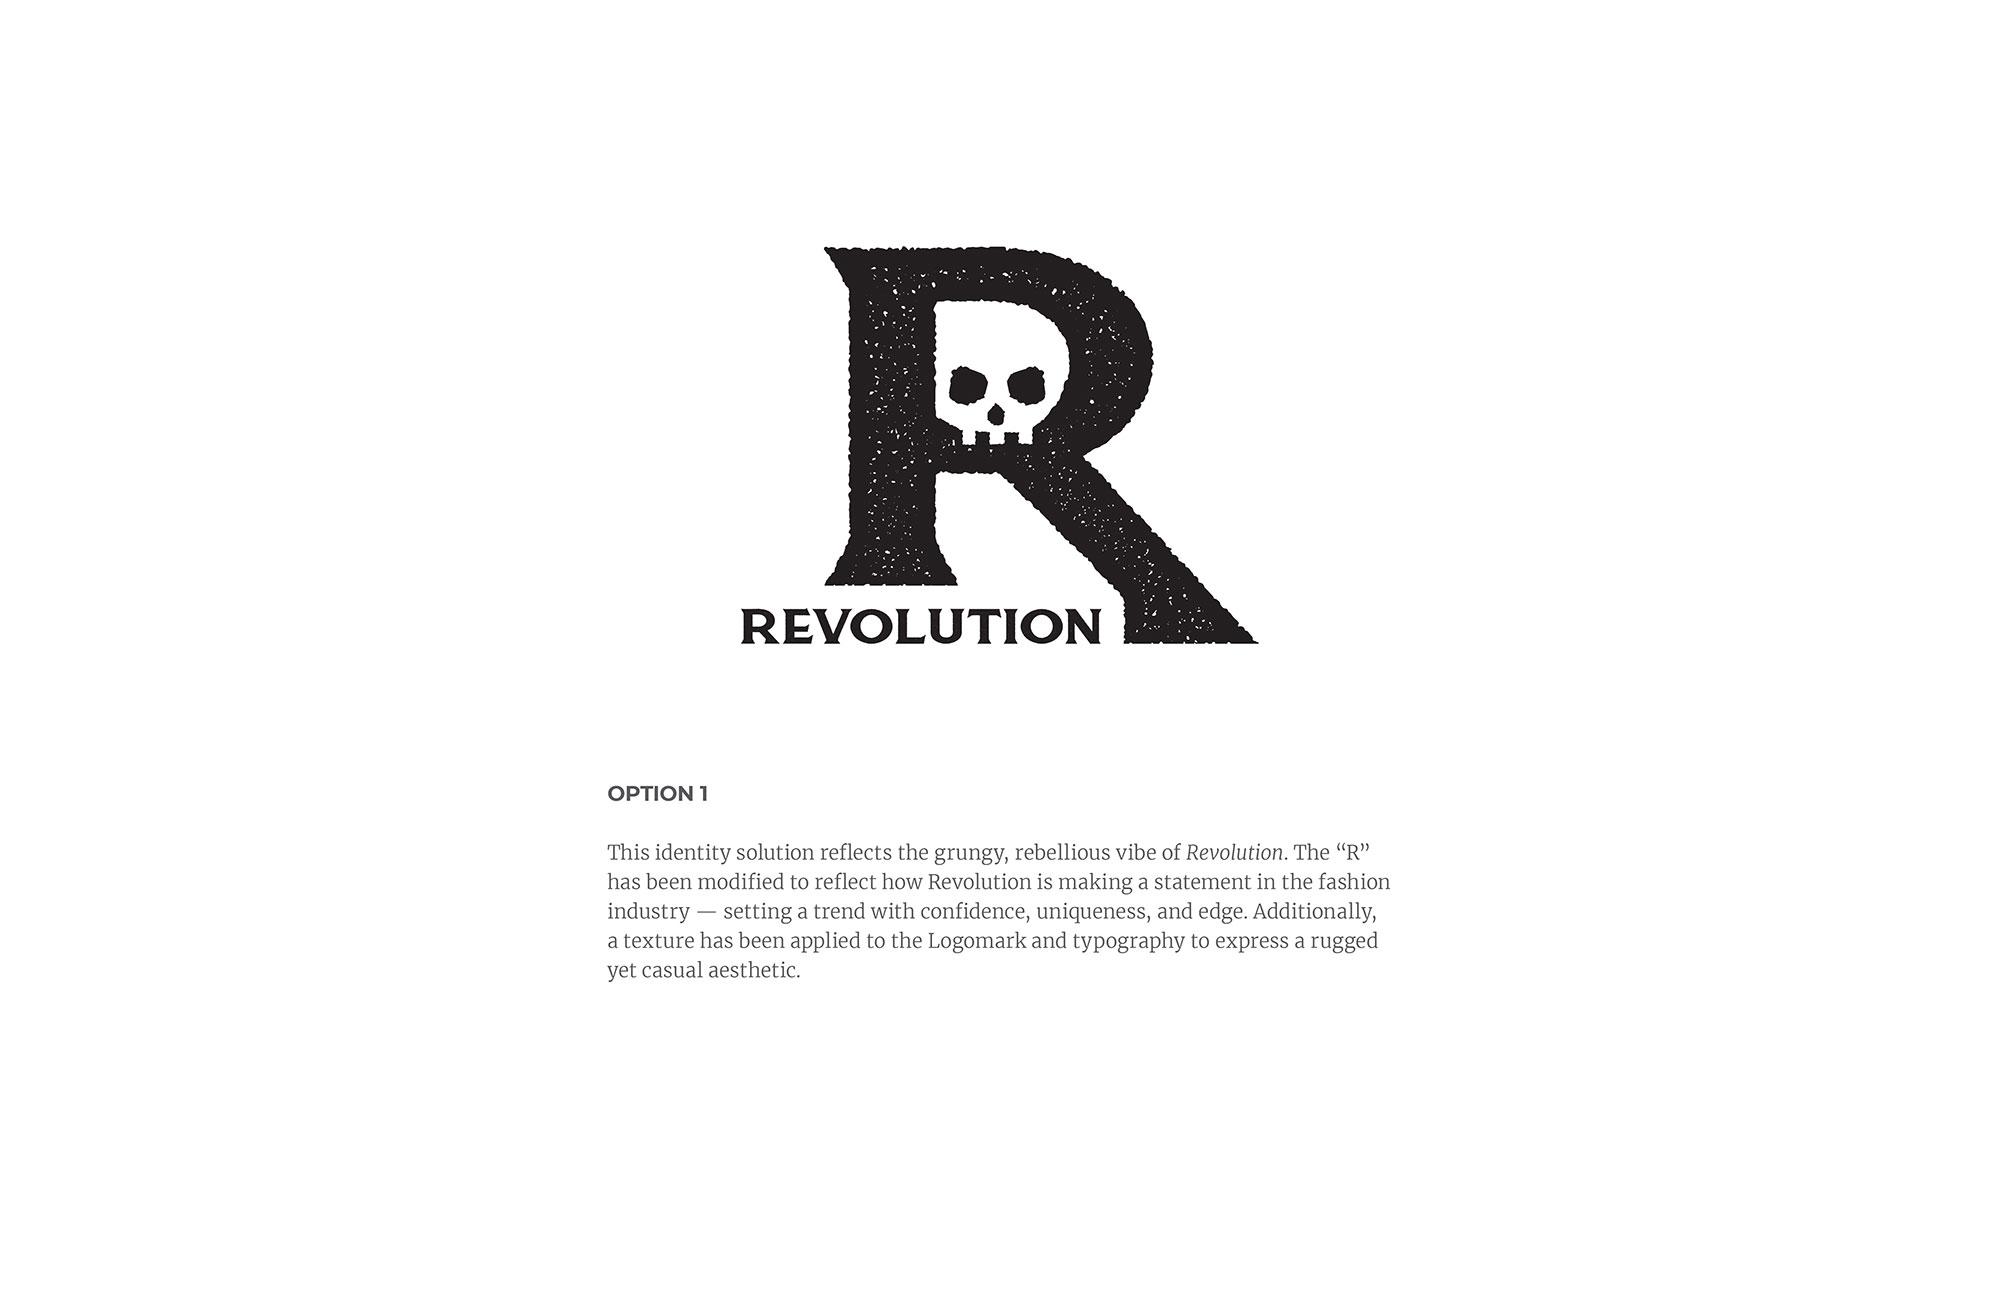 Revolution_Concepts1-1